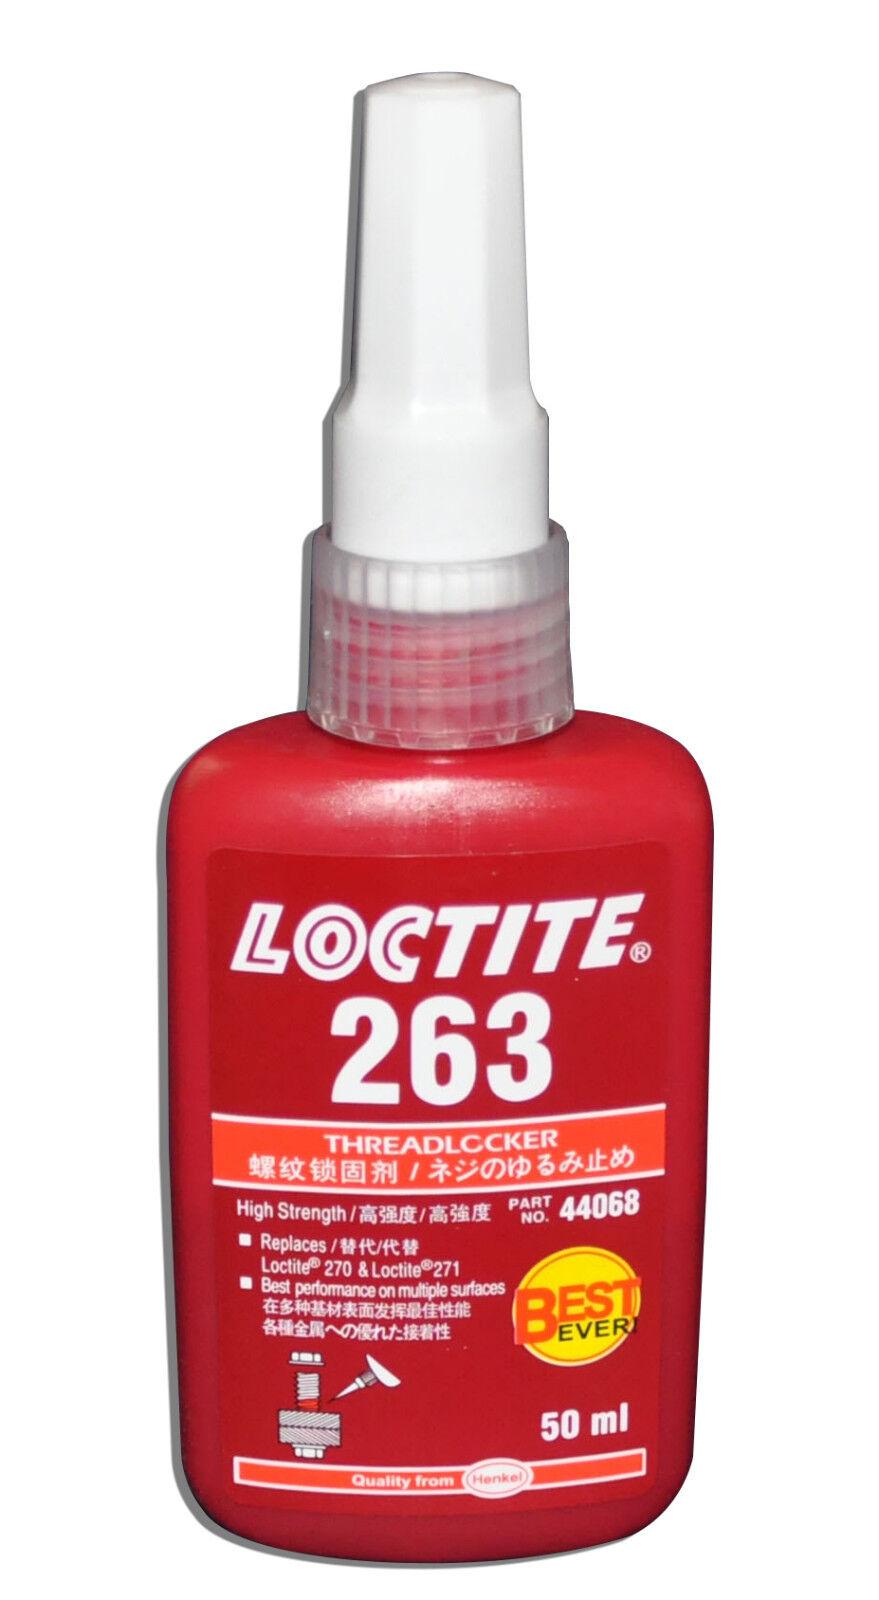 LOCTITE 263 HIGH STRENGTH THREADLOCKER HIGH STRENGTH LIQUID – 50 ML Adhesives, Sealants & Tapes